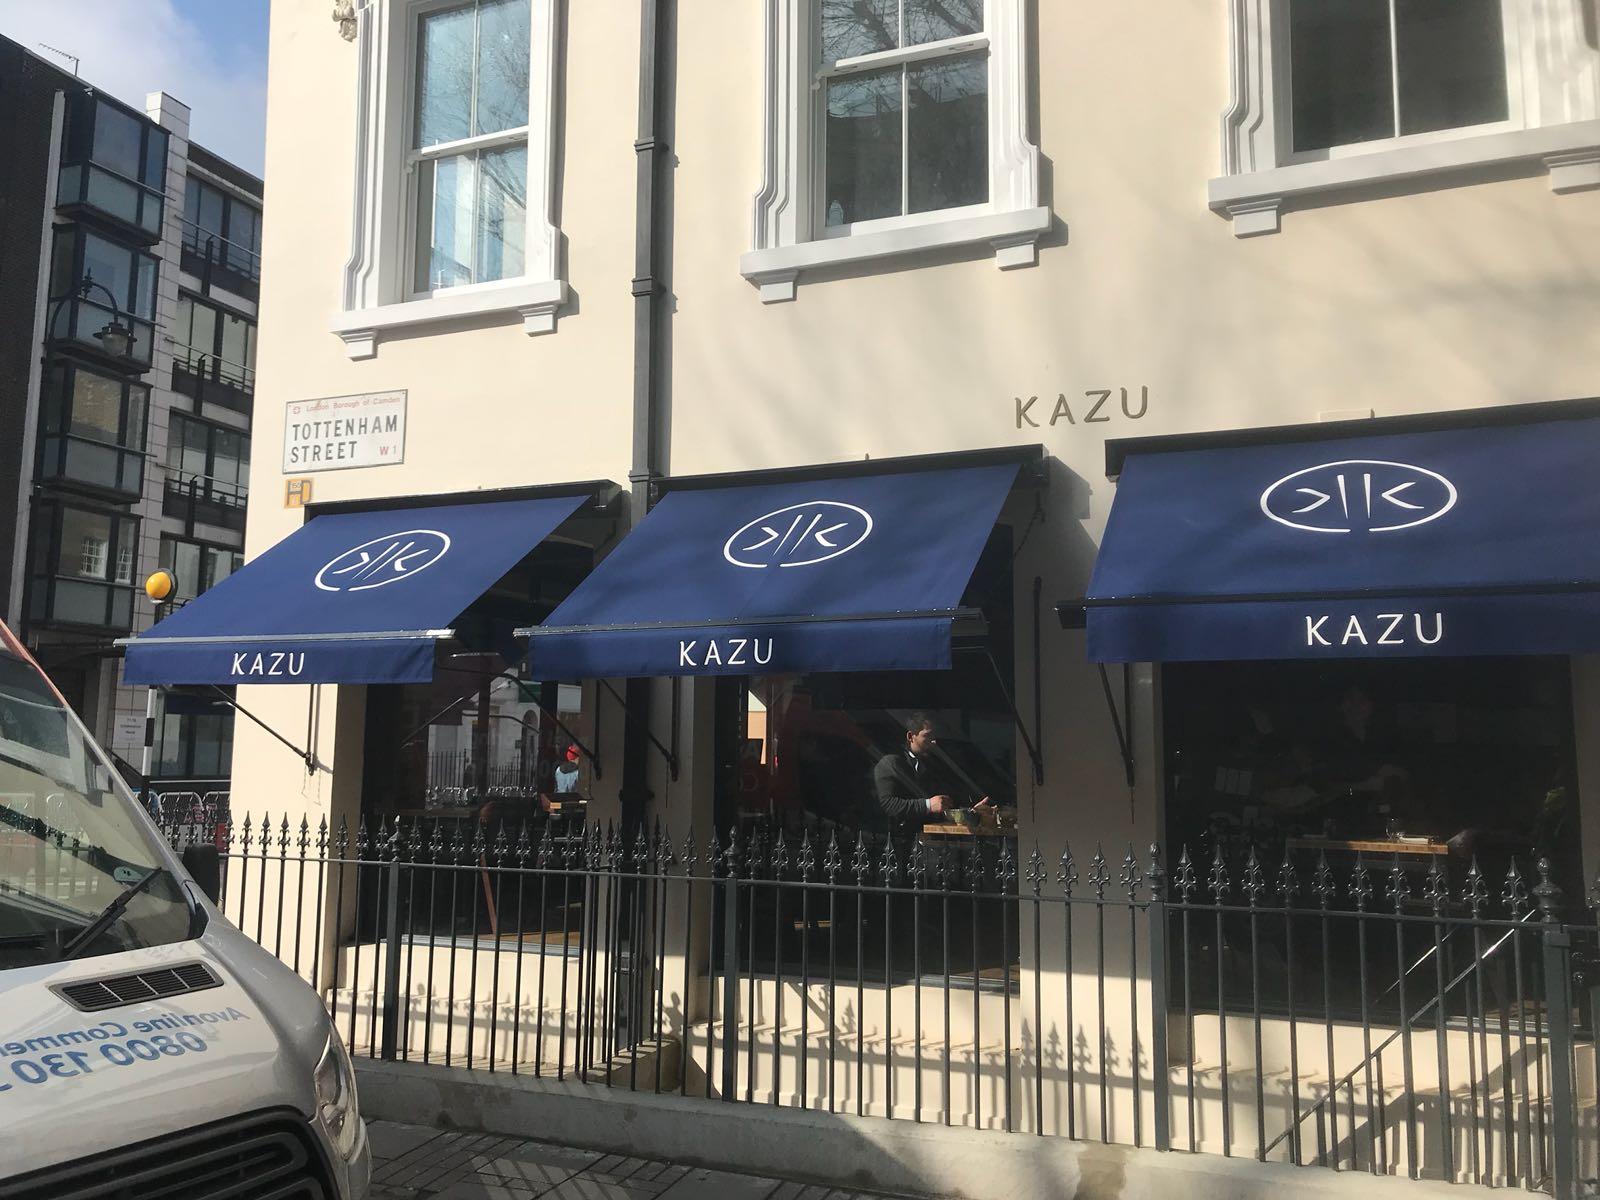 Kazu Charlotte Street Radiant Blinds Ltd